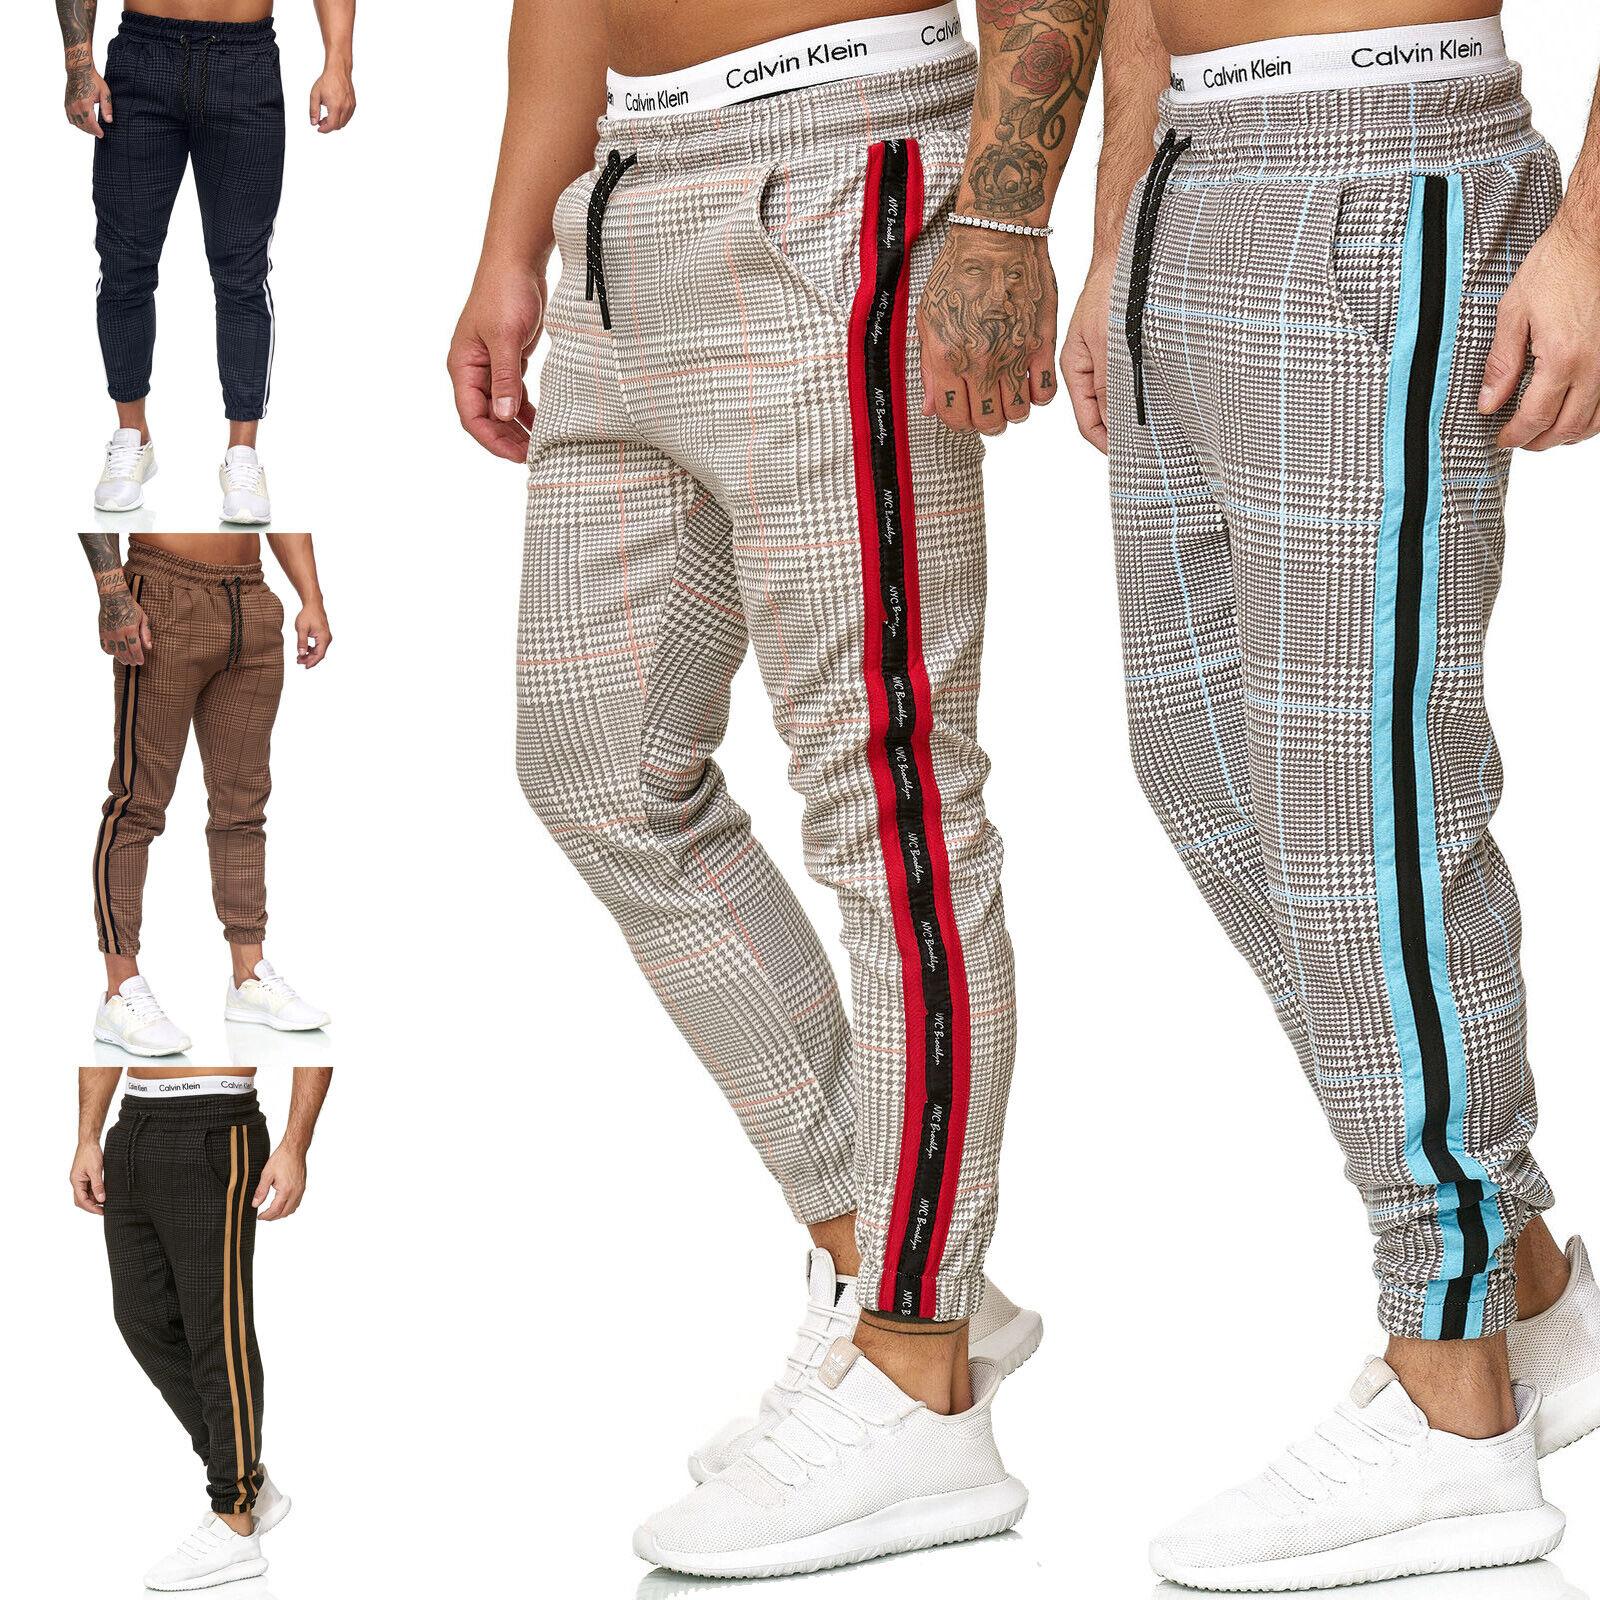 Jogging Sports Trousers Fitness Pants Tracksuit Bottoms Gym Training Men's